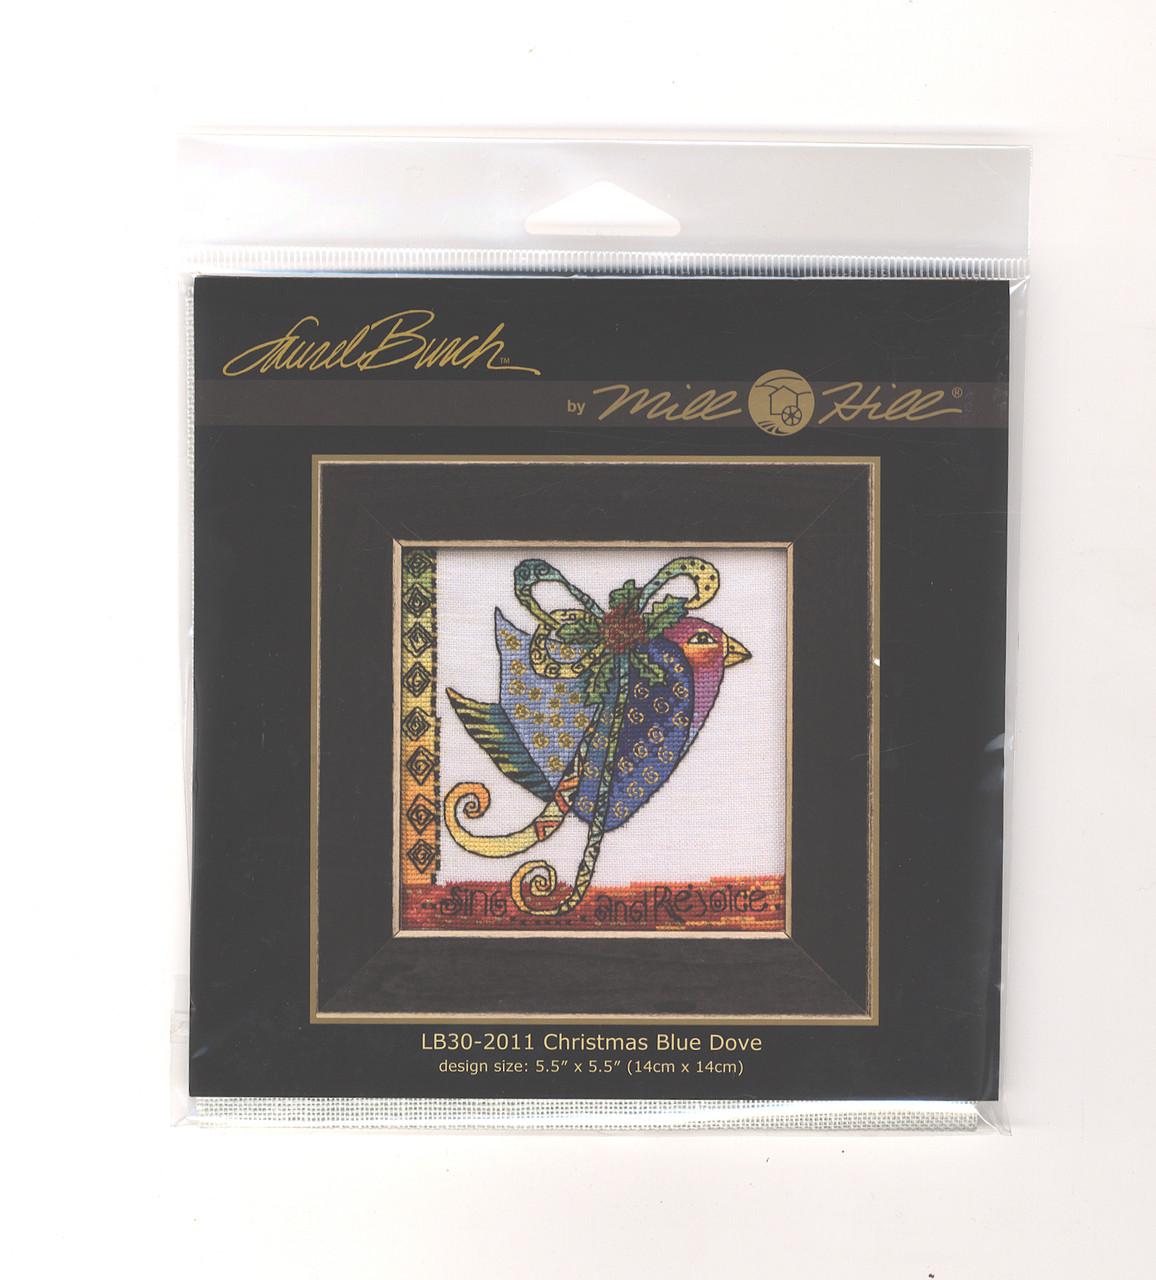 Mill Hill / Laurel Burch - Christmas Blue Dove